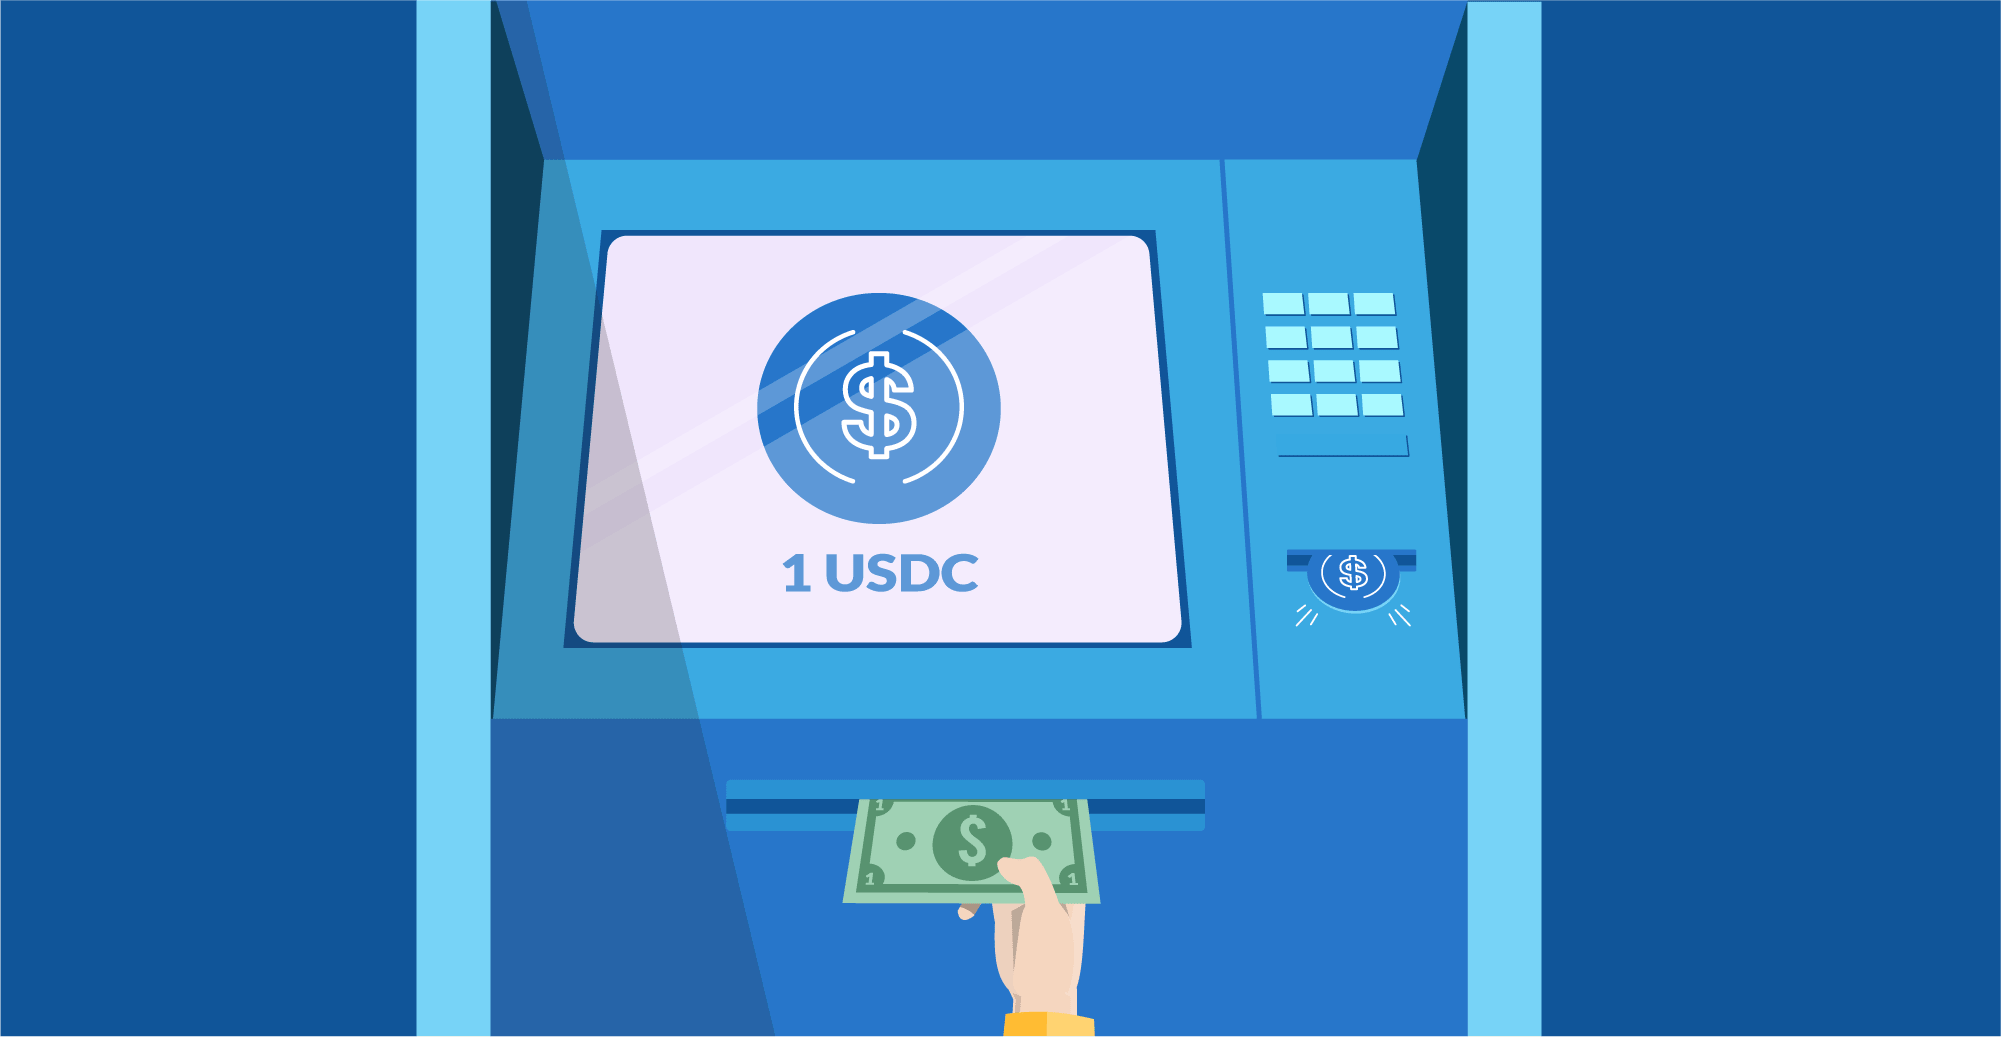 El modelo USDC de stablecoins